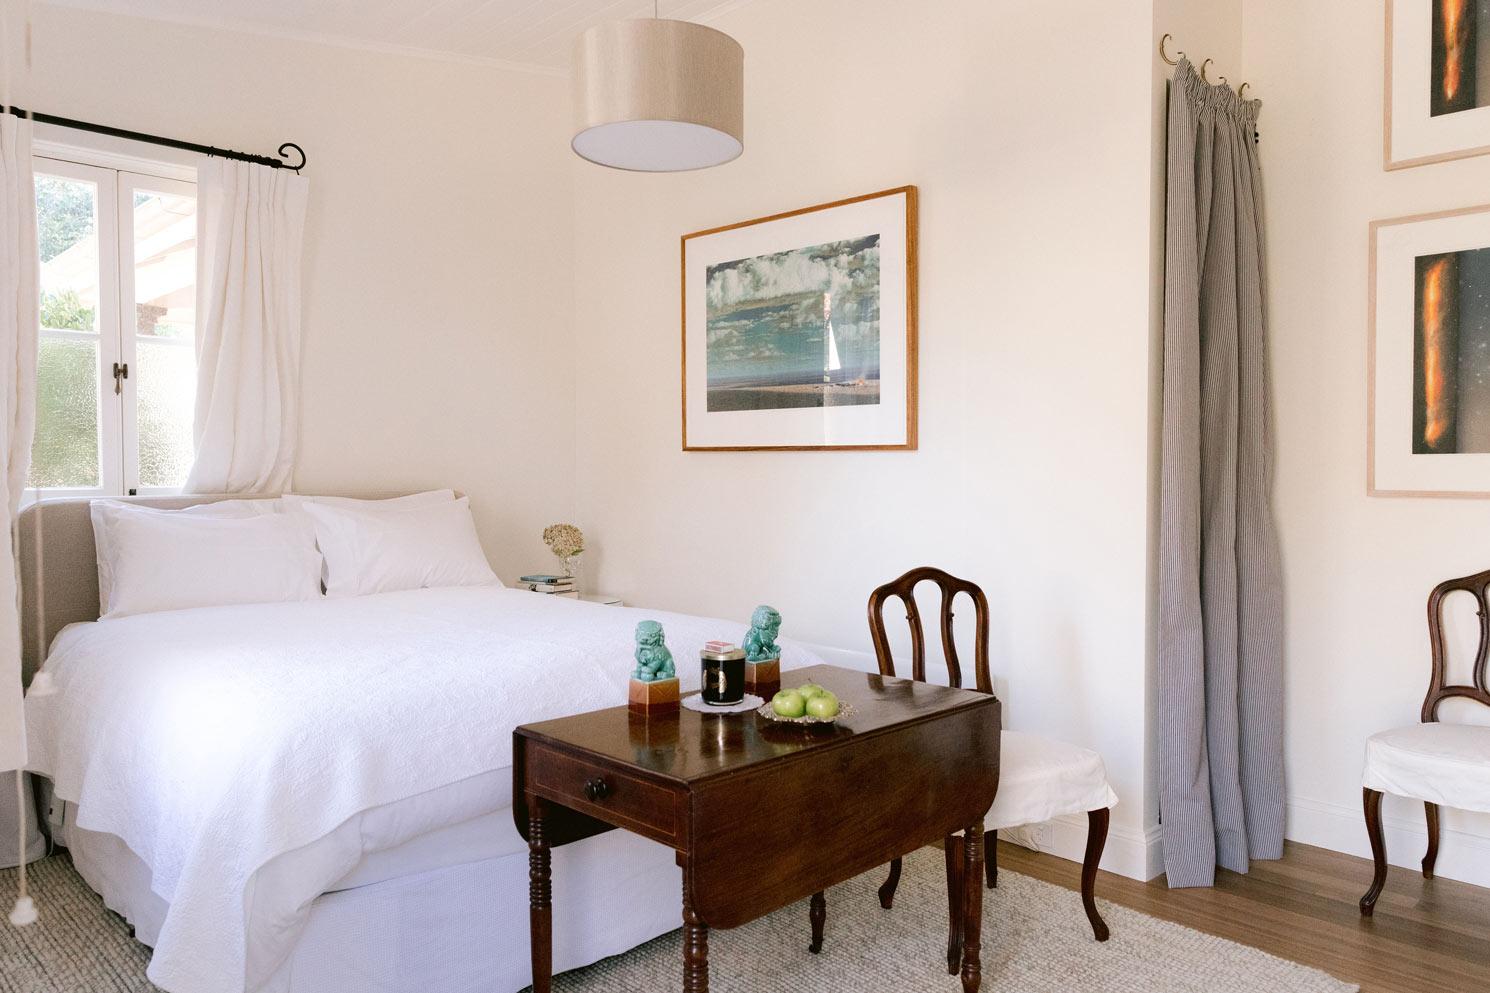 Maple-Terrace-Hopewood-House-Studio-Accommodation.jpg